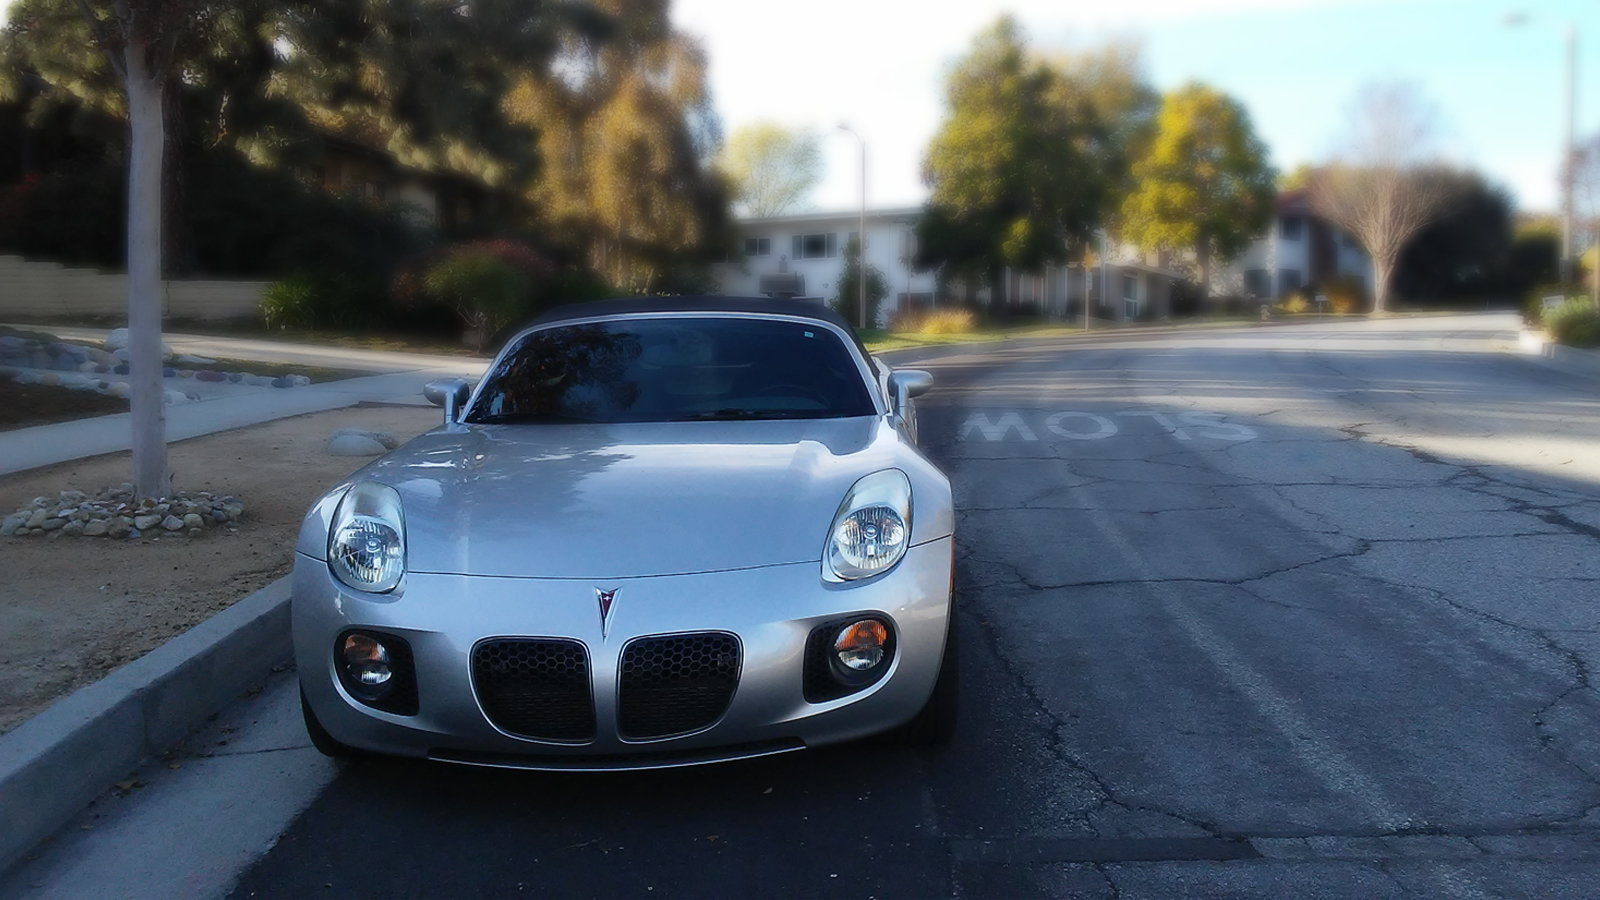 Pontiac Solstice GXP: The Underdog Sports Car